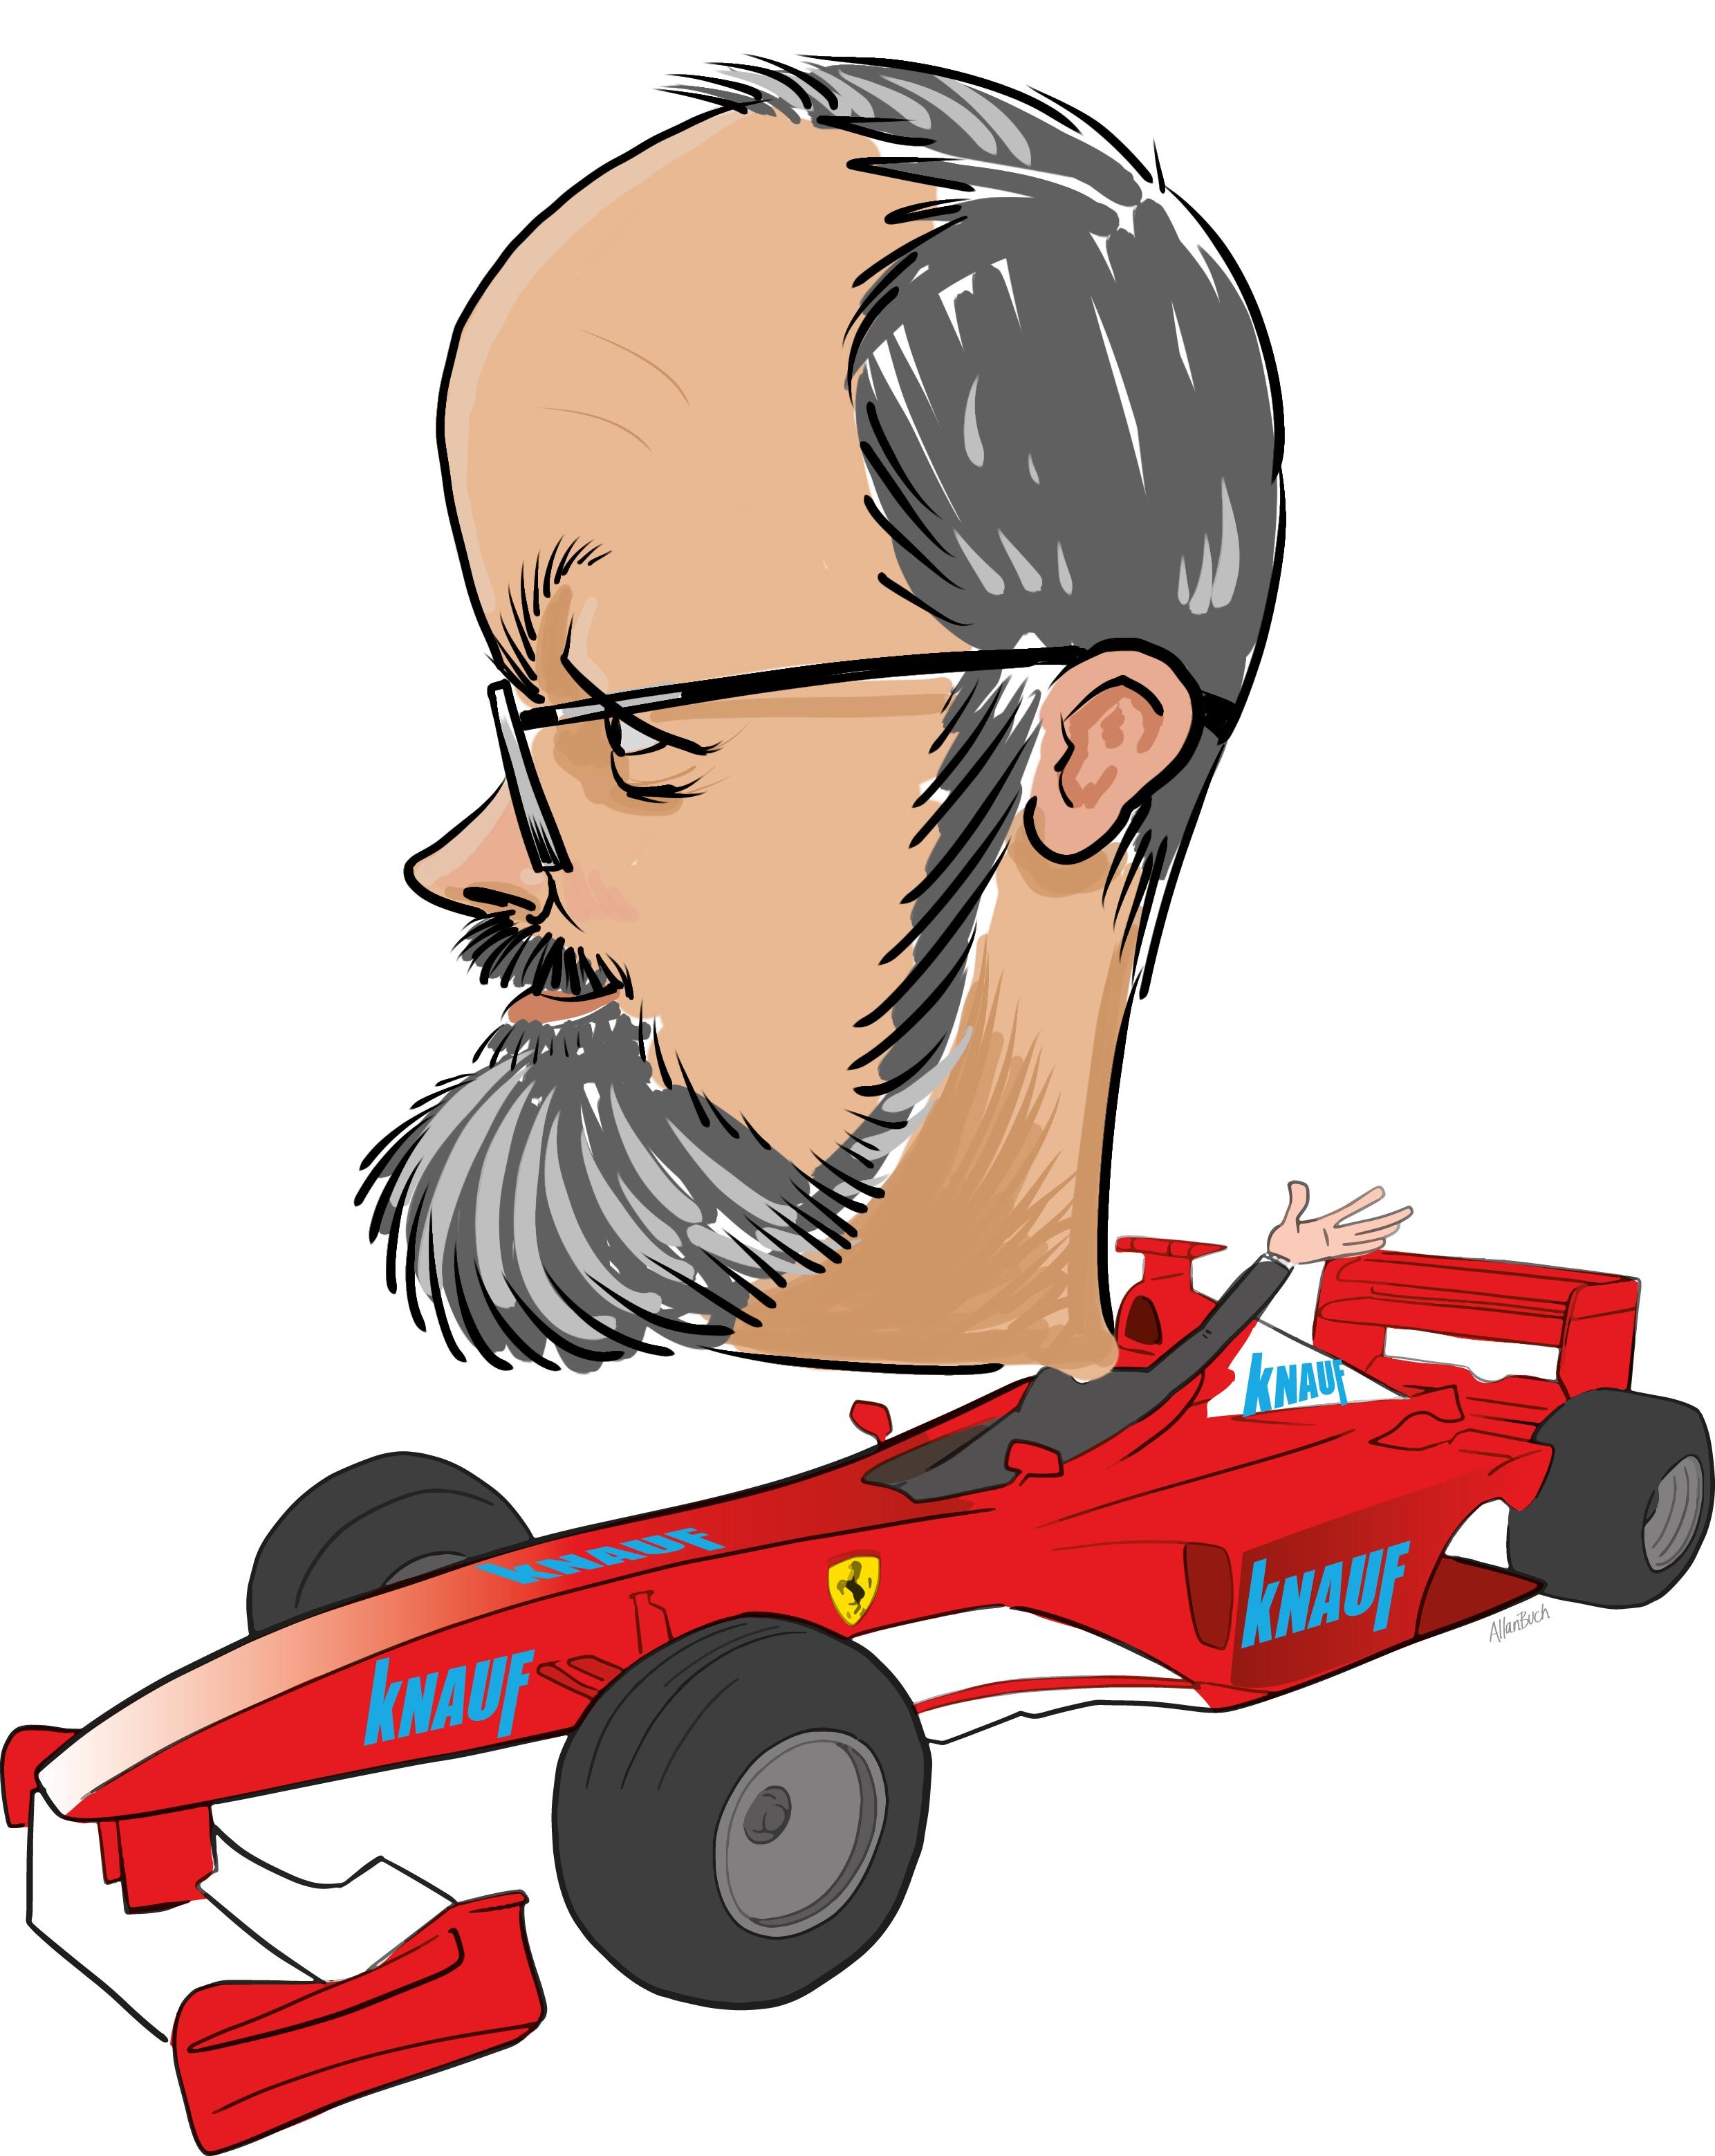 ipad Live karikatur med Allan Buch. farve profiltegning12